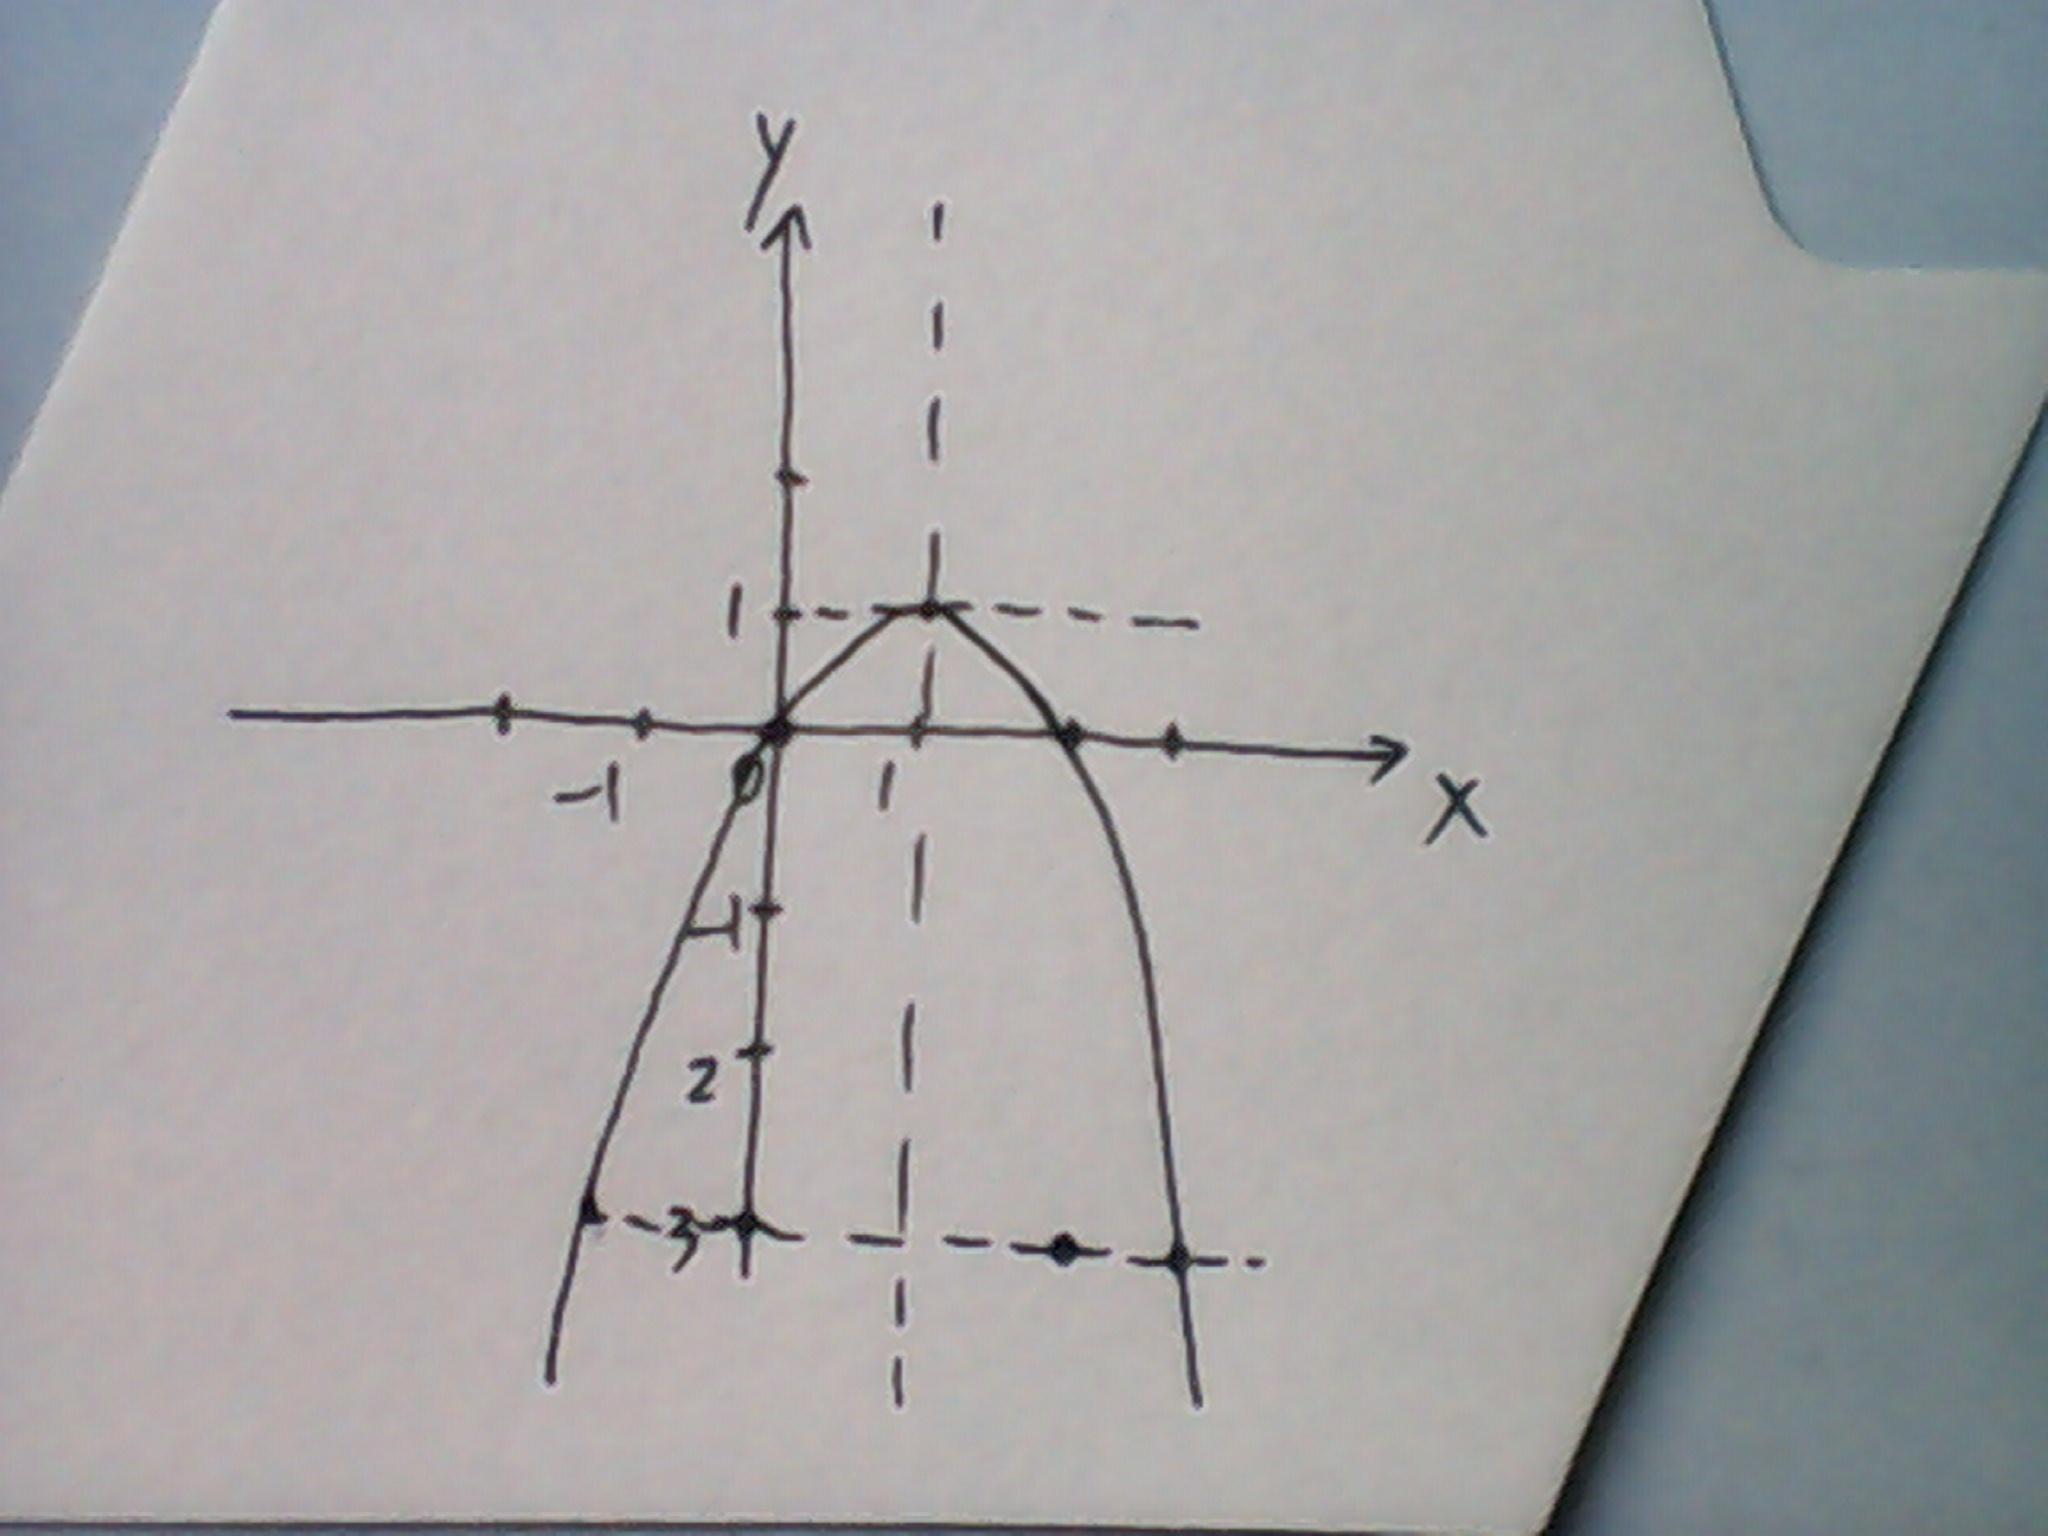 �yf�LL�zx�Z�_f(x)=(x05-1)^n f^(n 1)(-1)=? 当x=-1时 f(x)的n 1